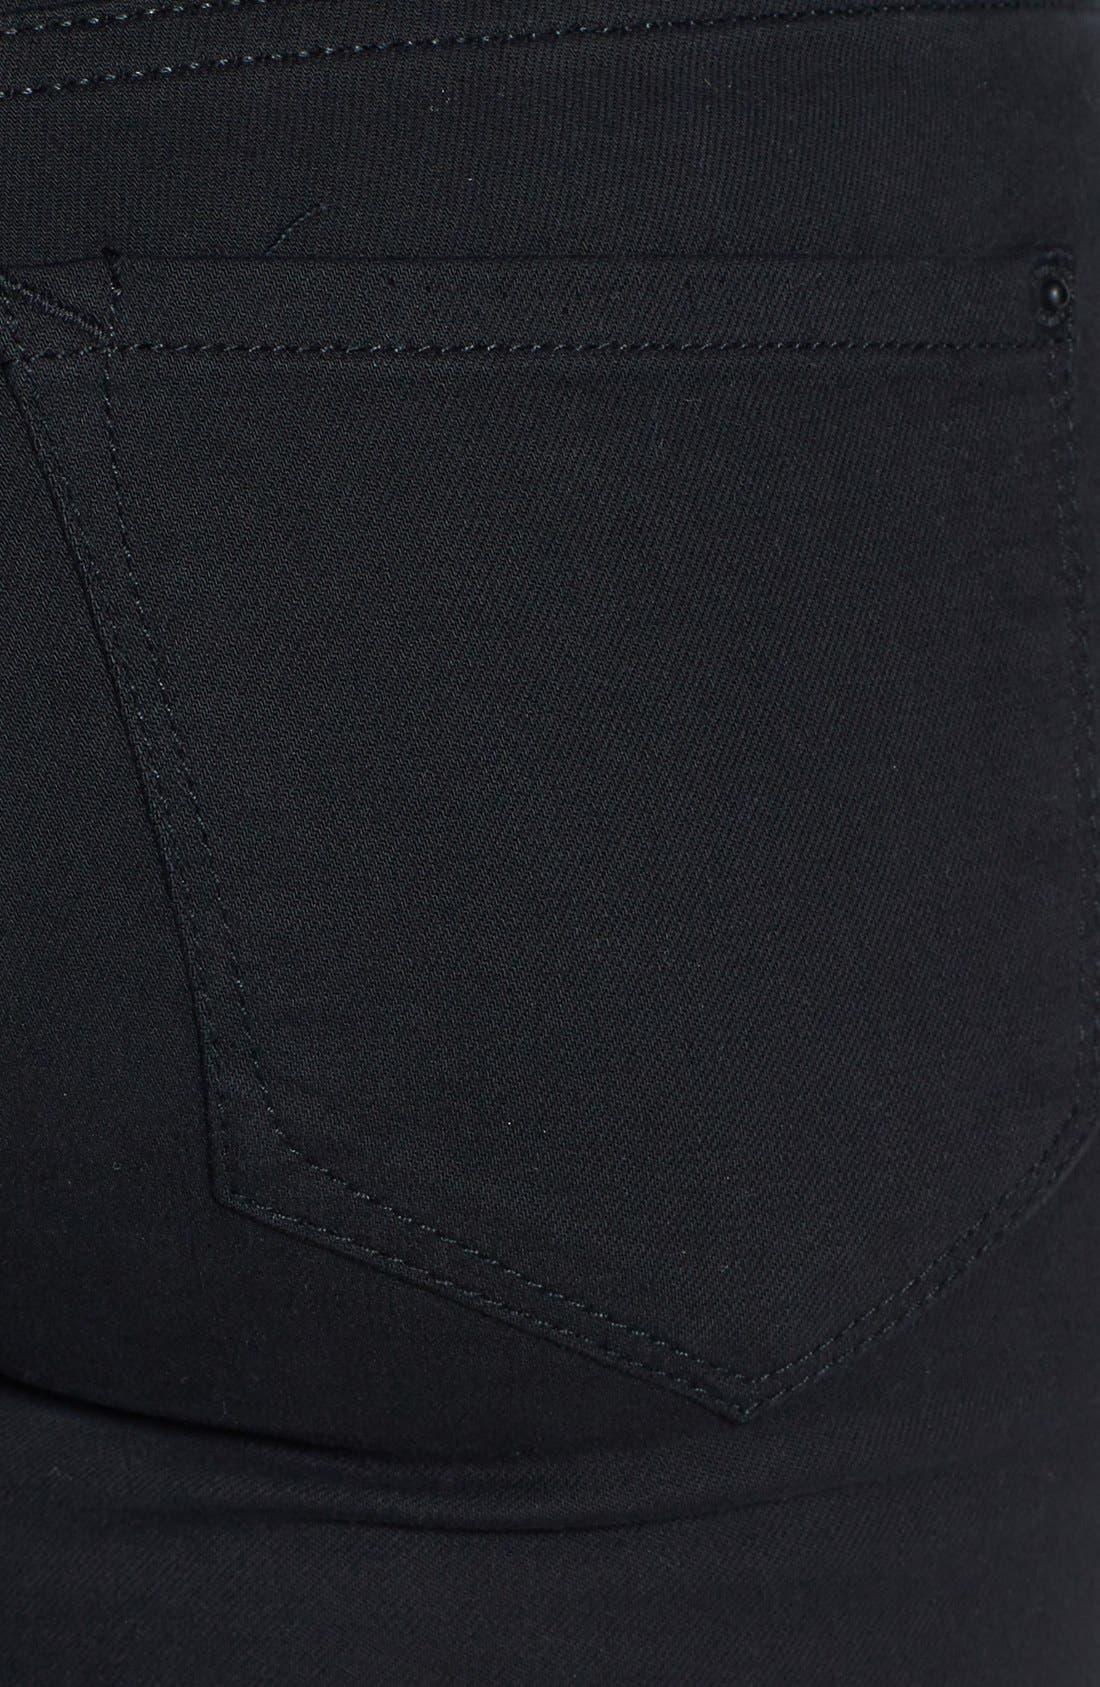 Alternate Image 3  - kensie 'You Look Pretty' Stretch Denim Skinny Jeans (Black)